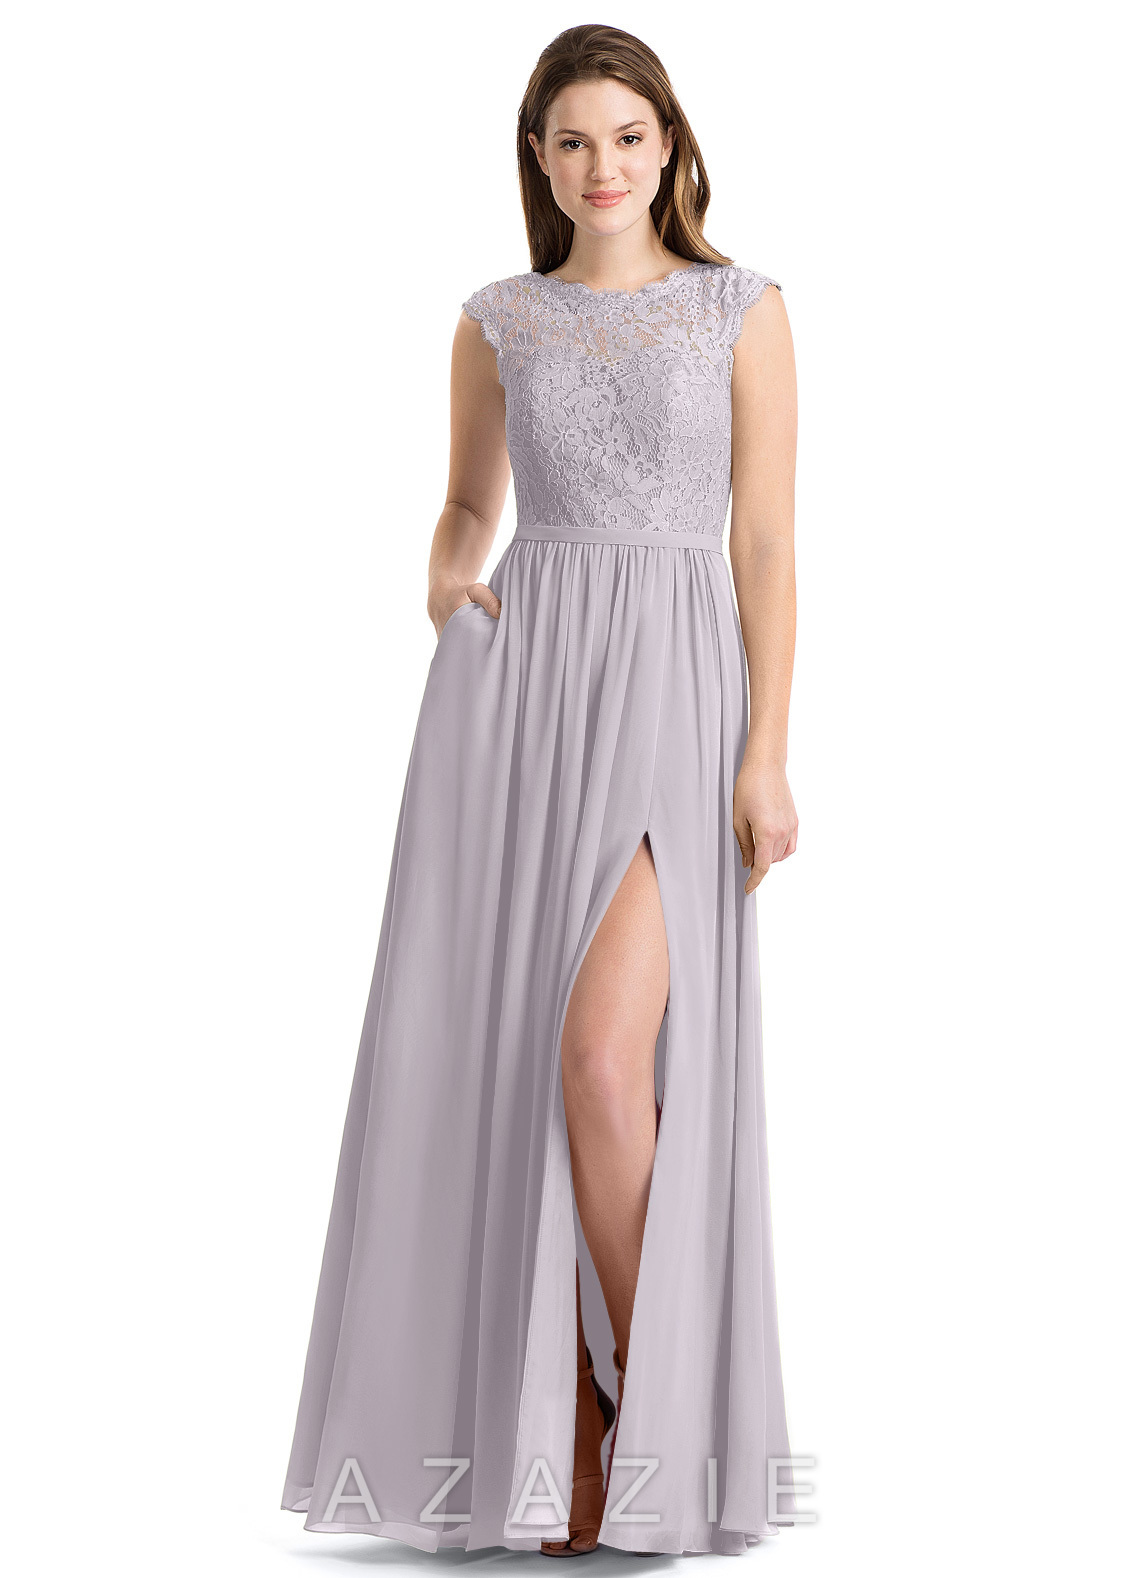 75354ab0924 Azazie Arden Bridesmaid Dresses